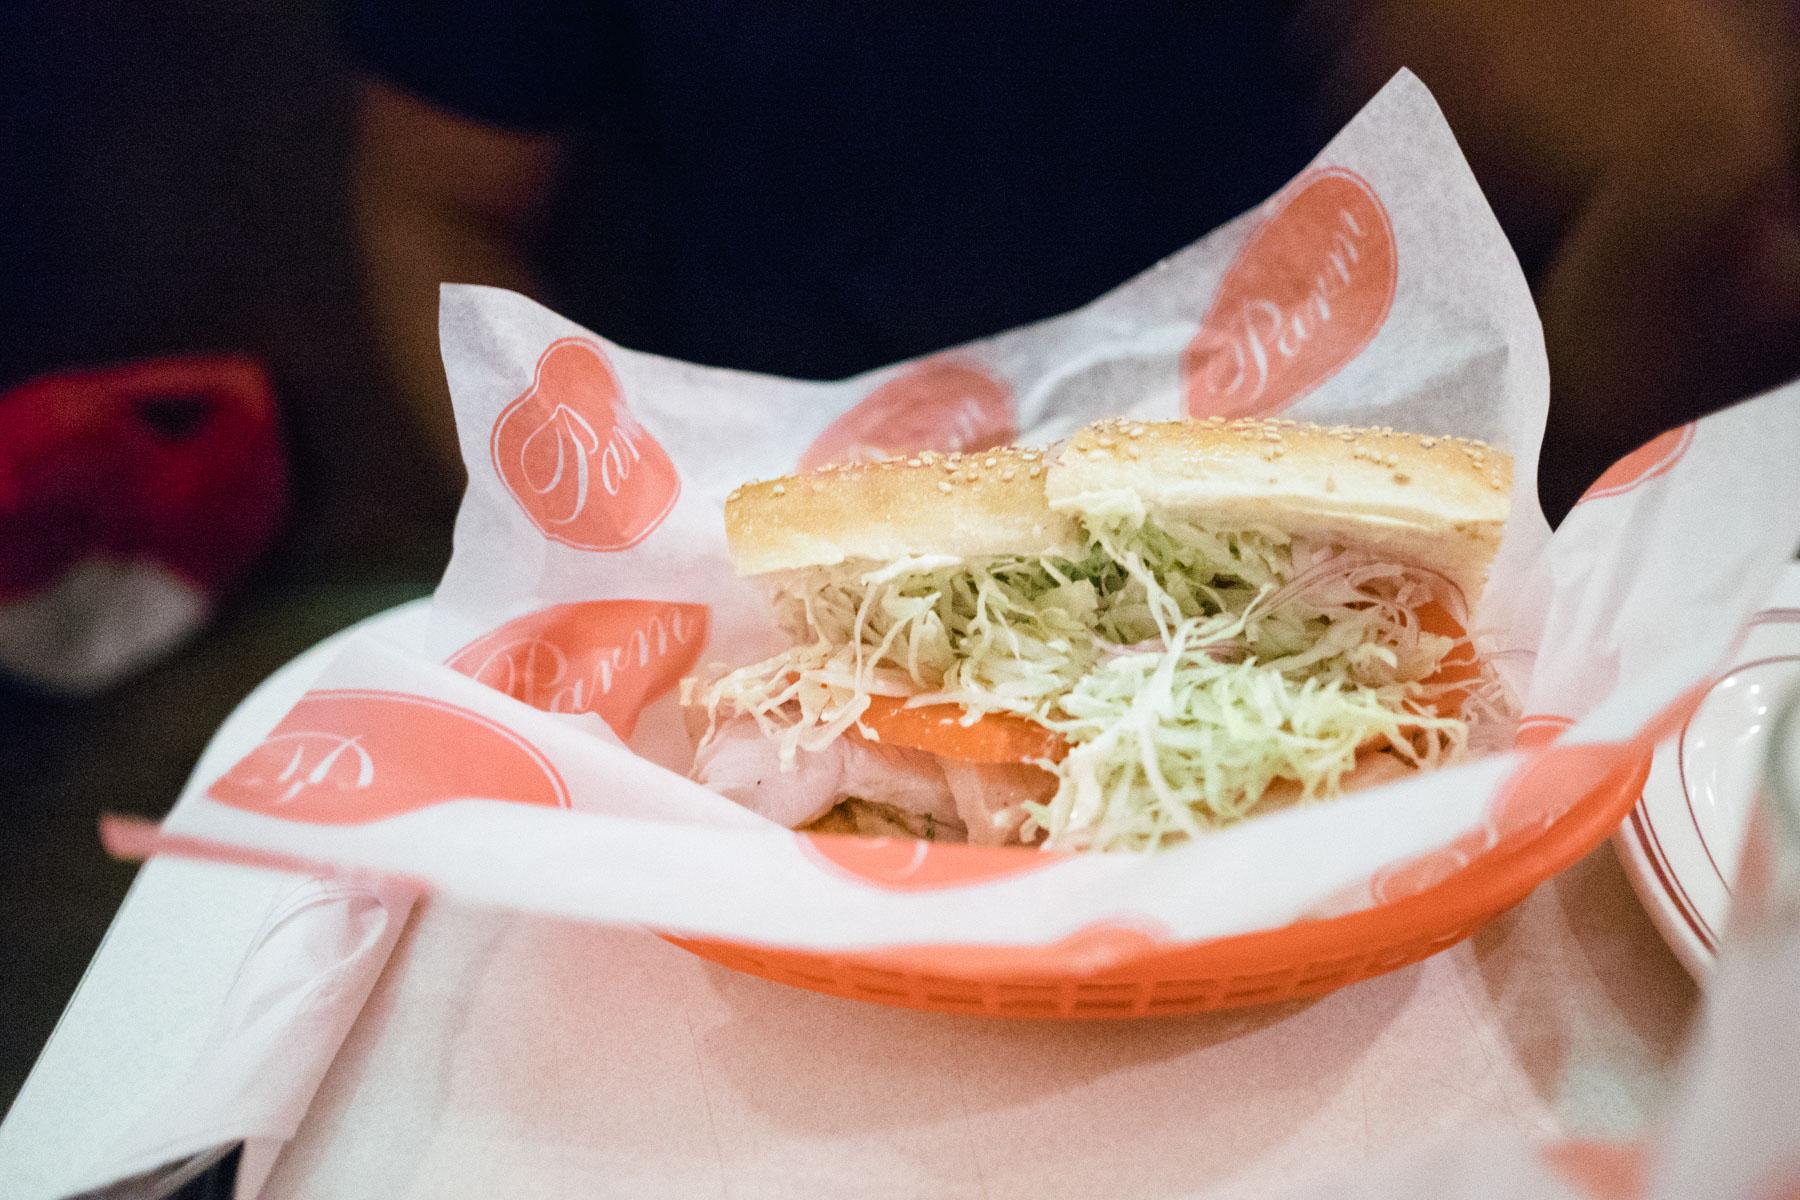 parm-nyc-restaurant-american-italian-food-little-italy-new-york-city-chicken-parm-mozza-4